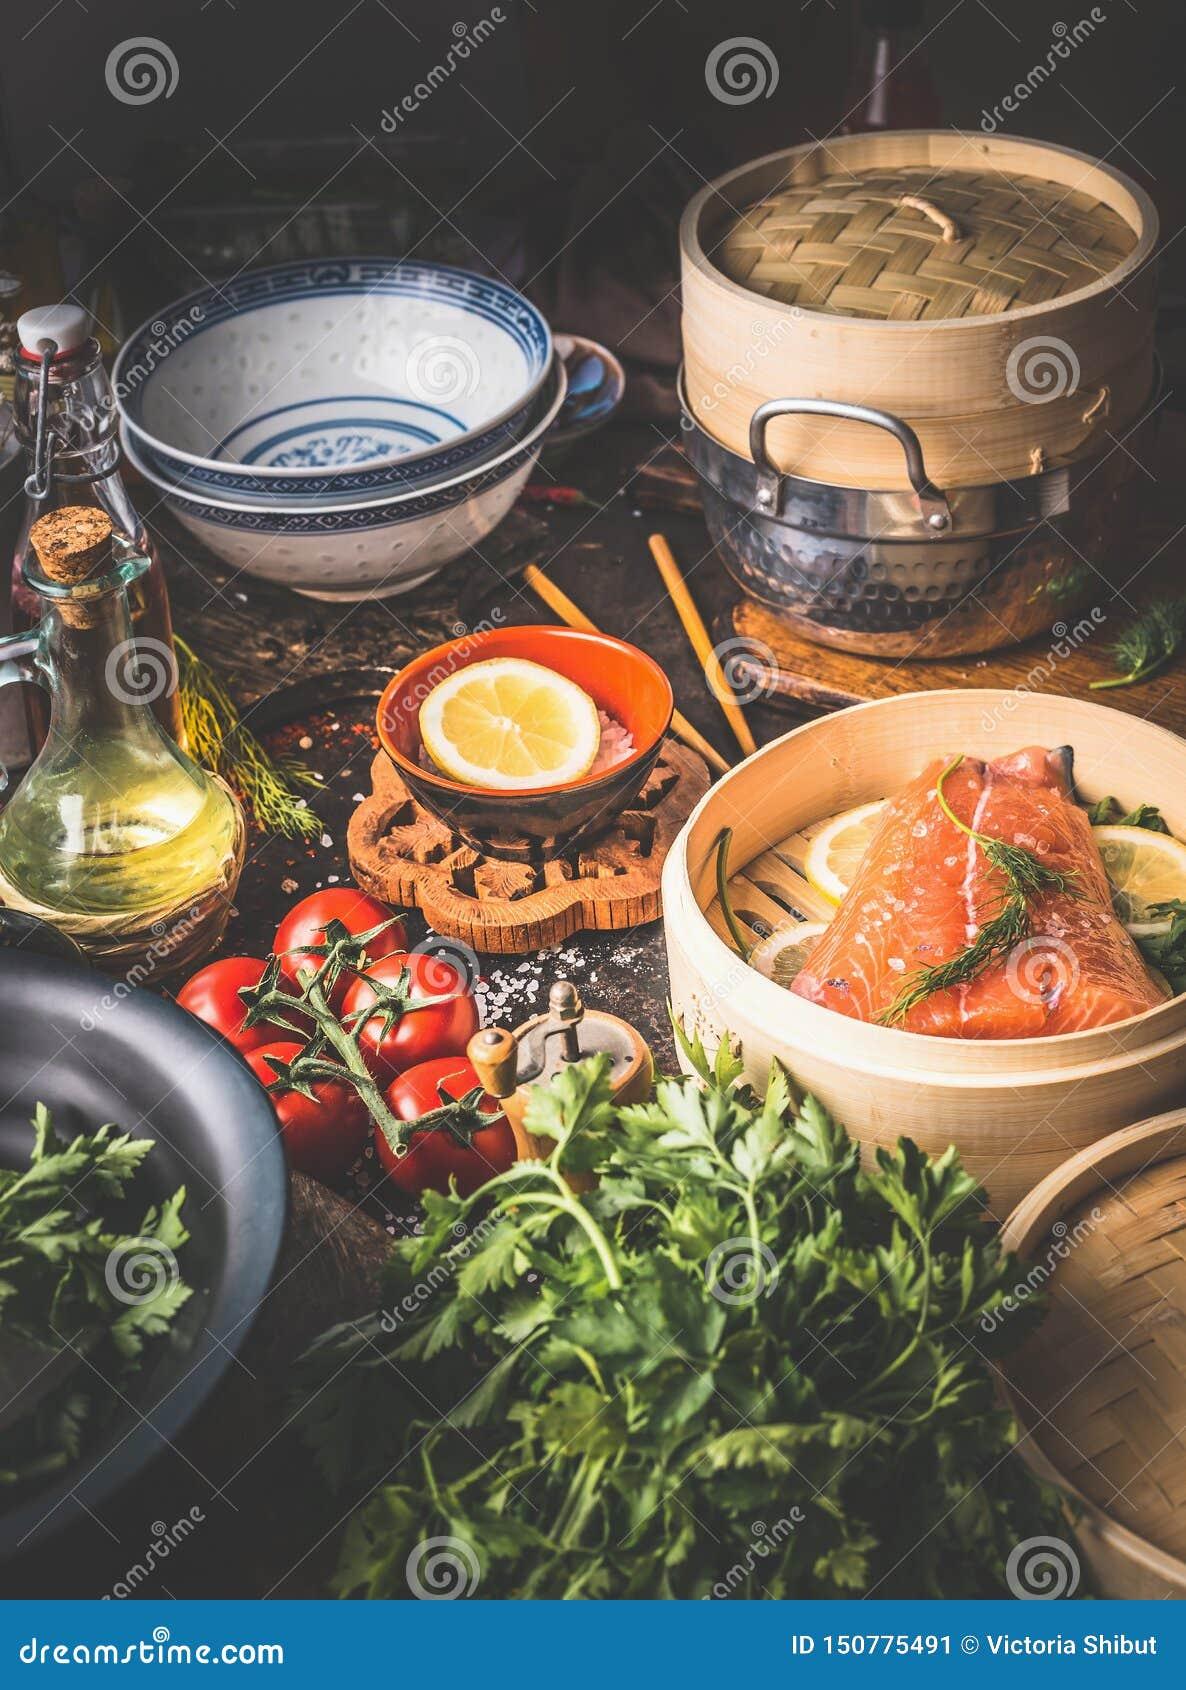 E Διάφορα συστατικά, εργαλεία και εργαλεία στον πίνακα κουζινών Αυθεντική ασιατική μαγειρεύοντας προετοιμασία τροφίμων με το σολο